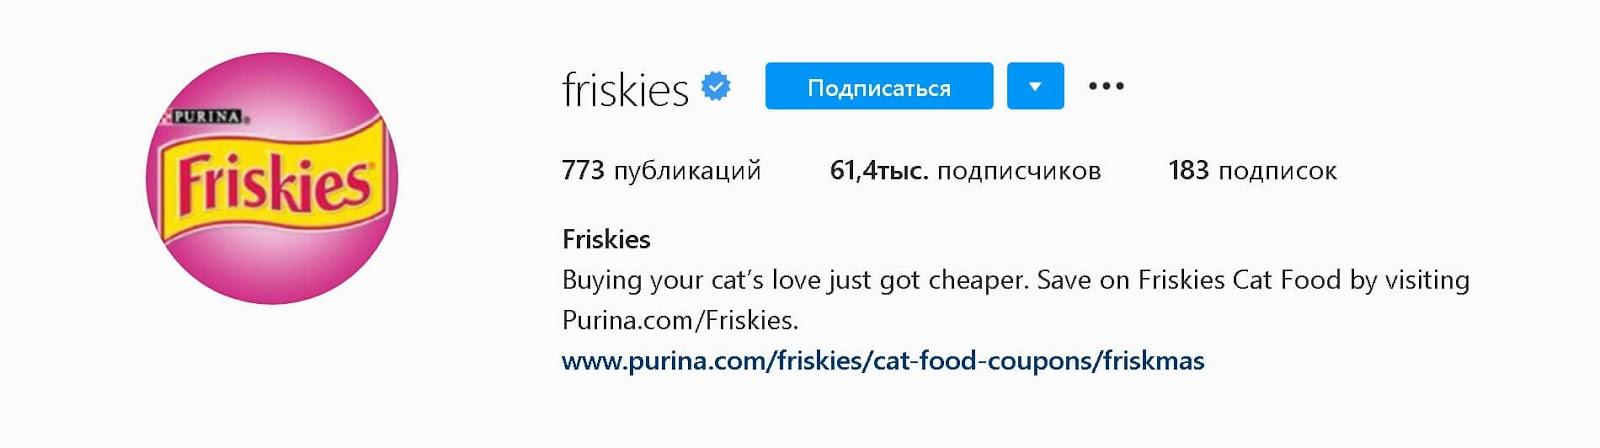 instagram-bio-friskies